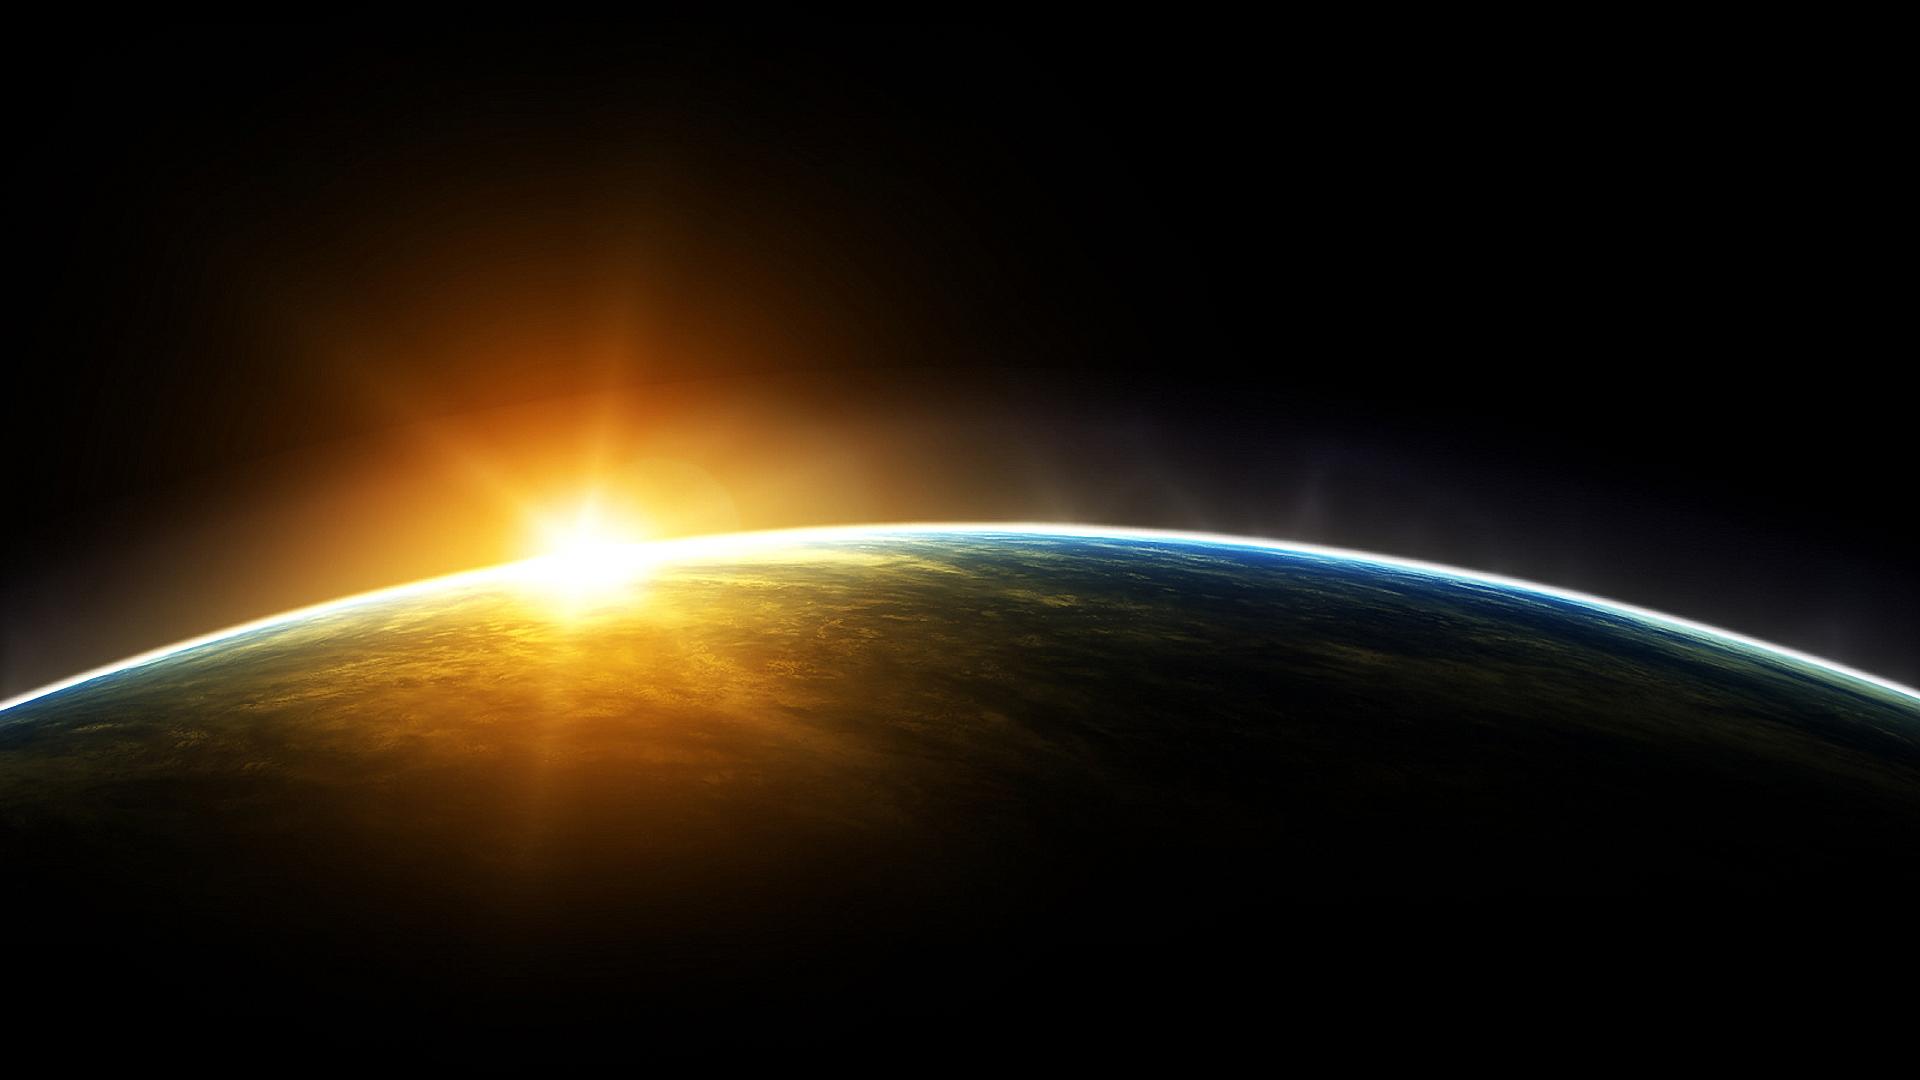 earth wallpaper hd 1080p - photo #22